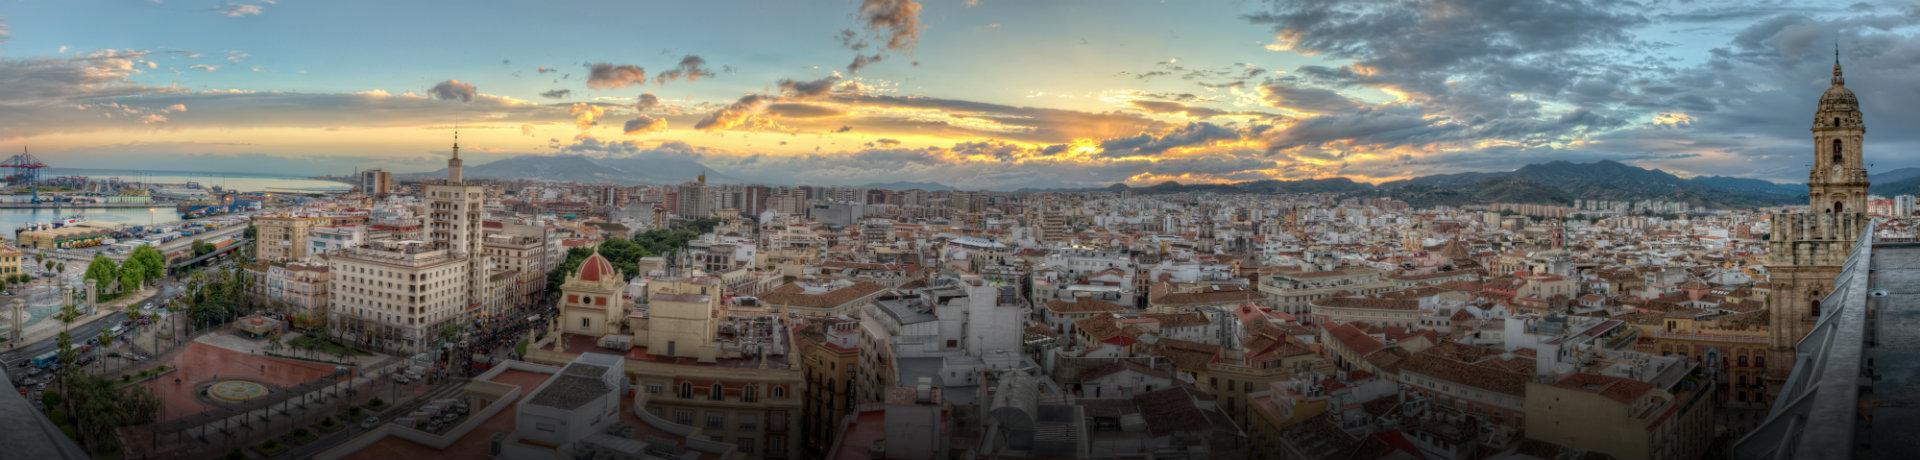 Malaga - Sonnenuntergang